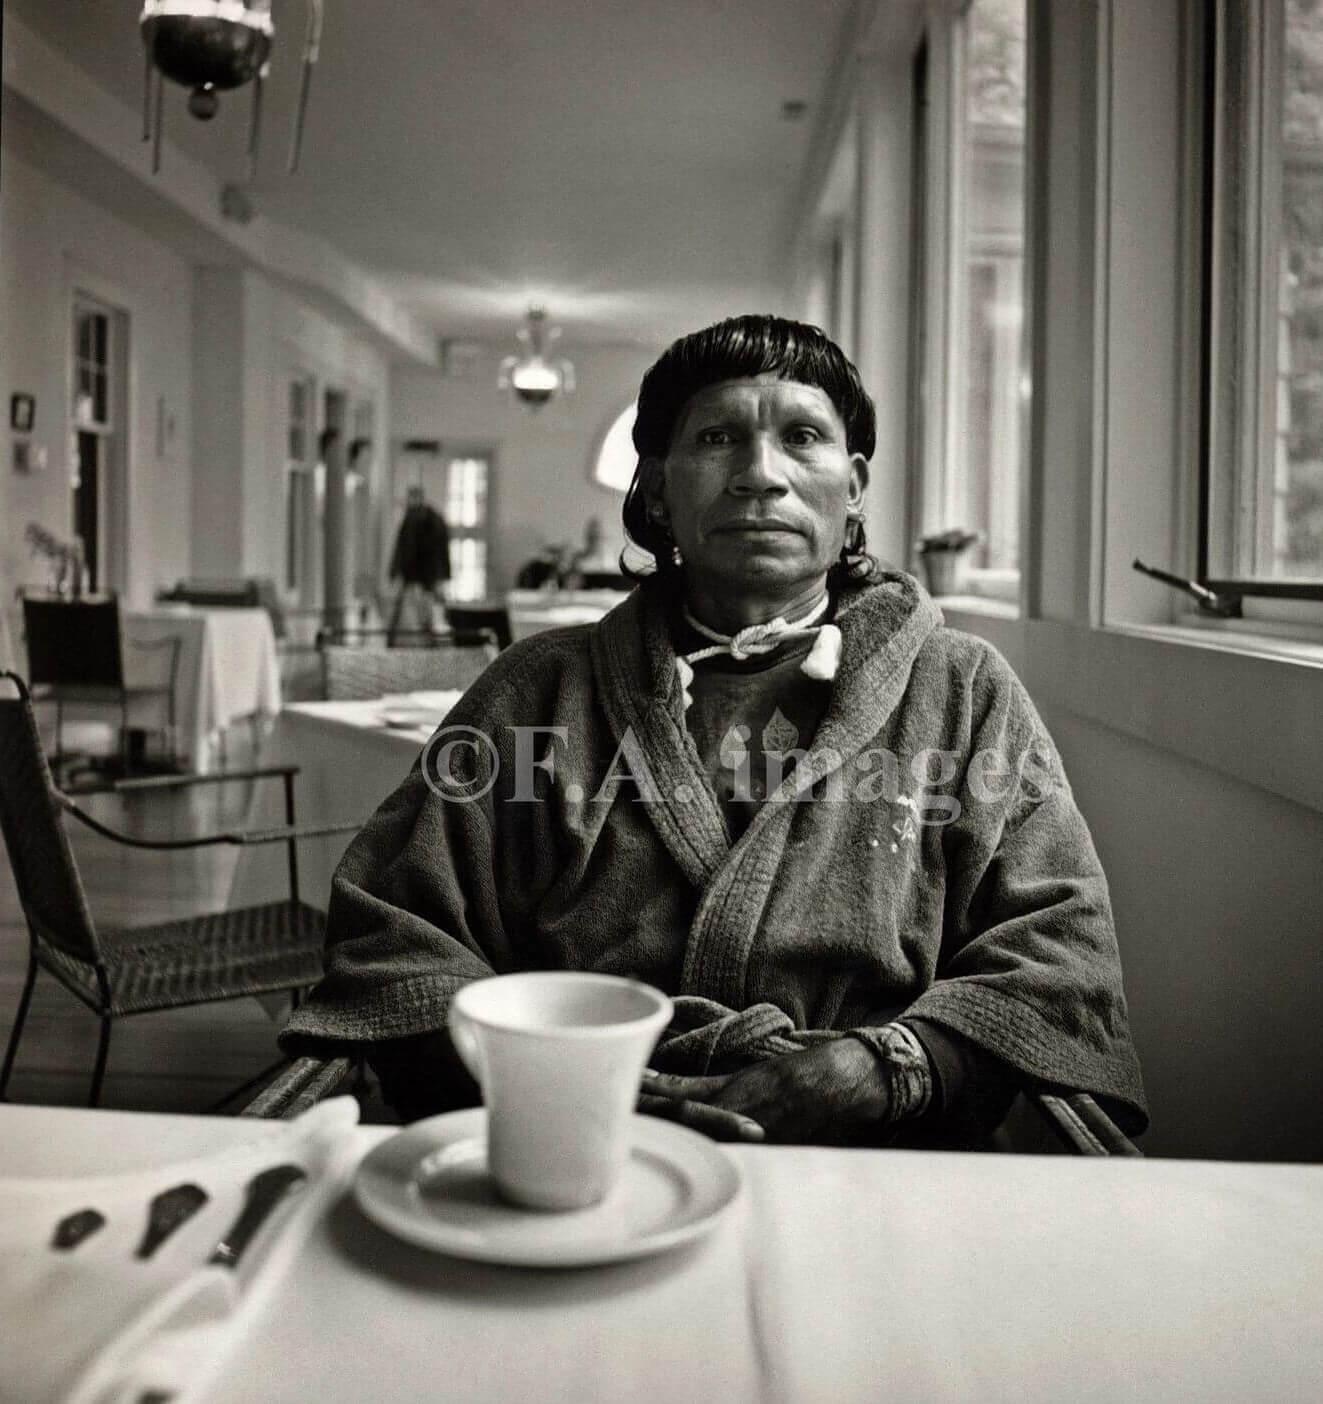 Fawn Anderson - humanitarian photography